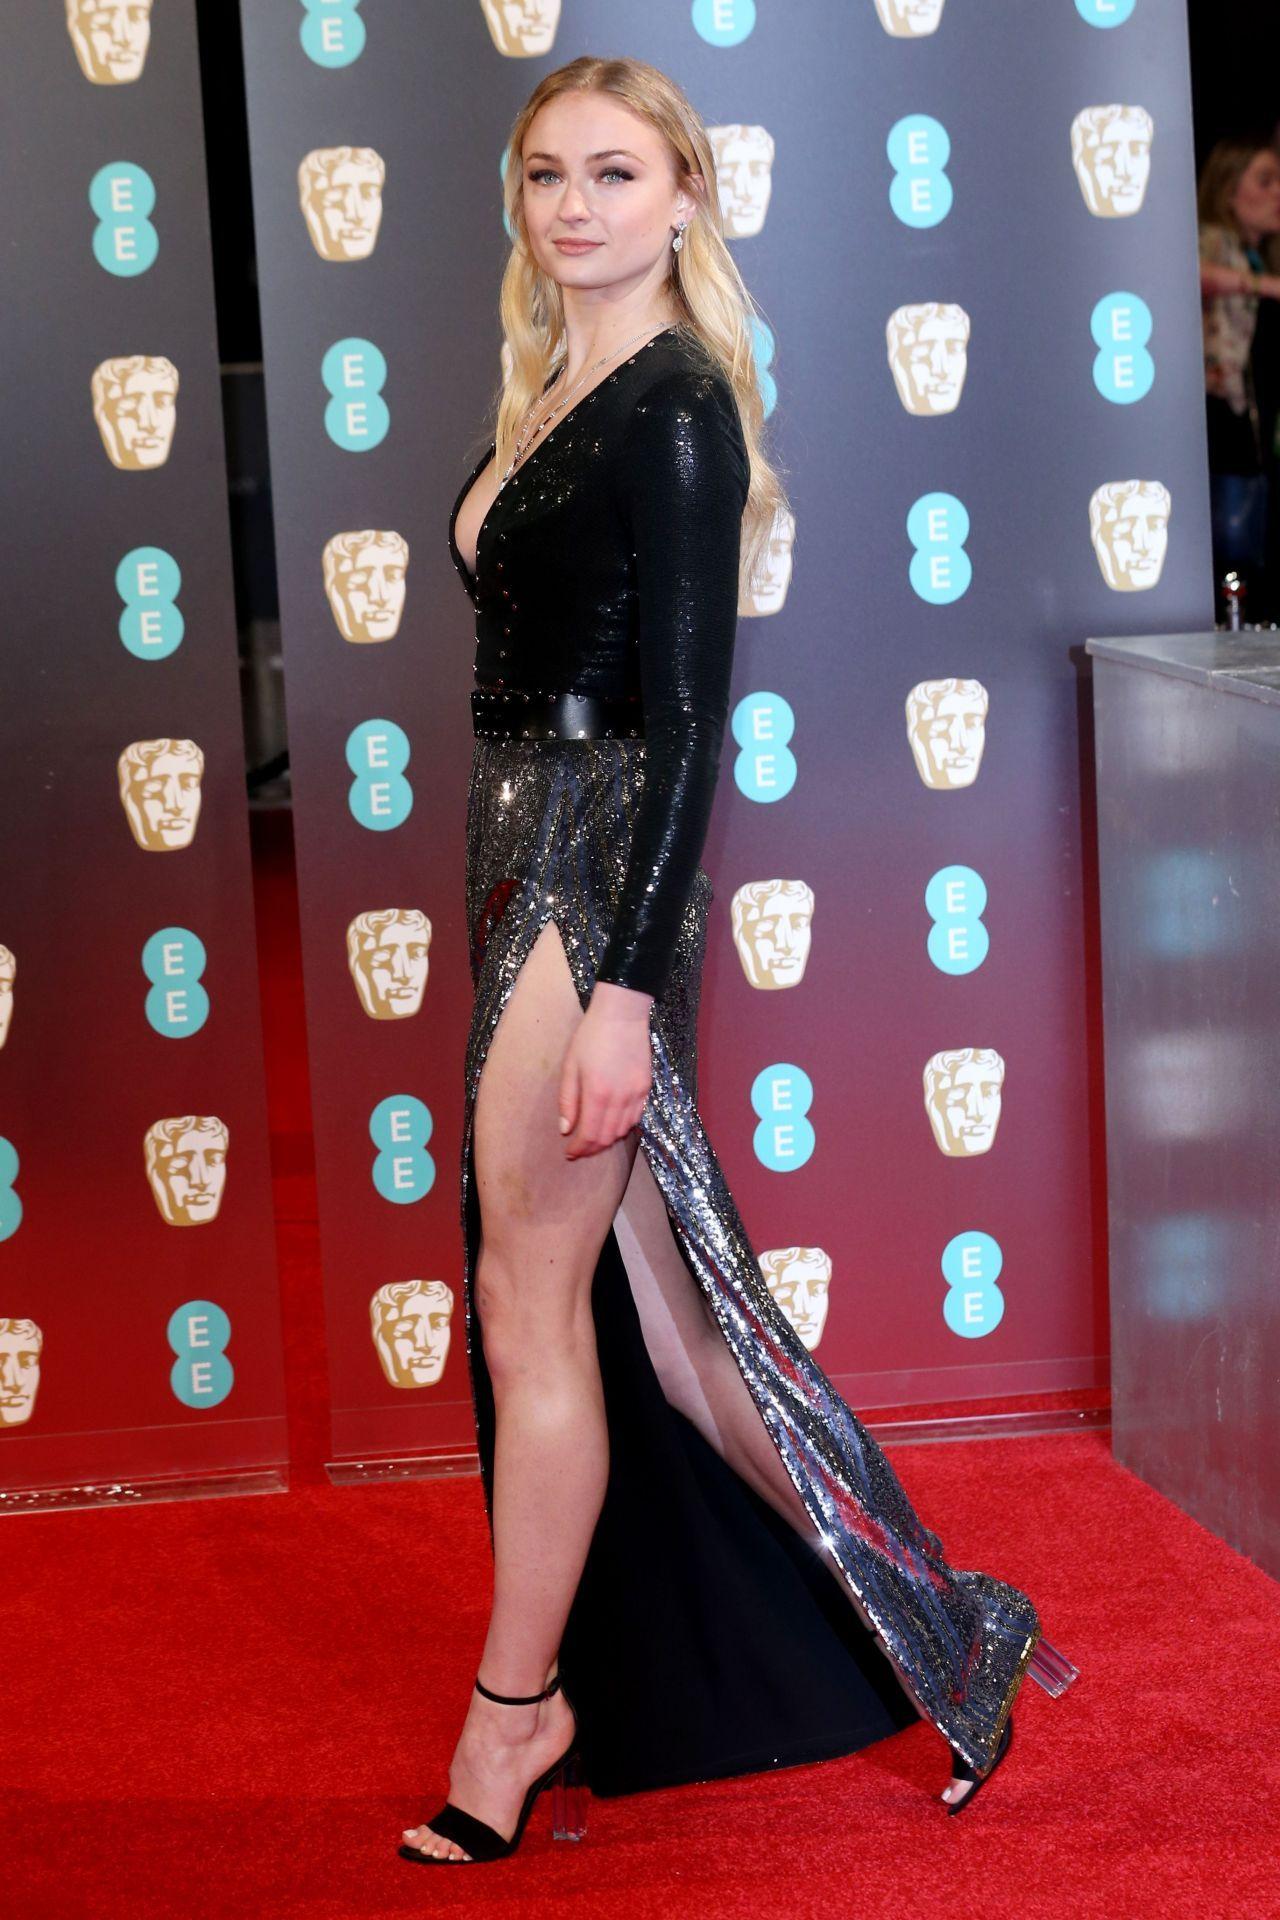 Sophie Turner in Louis Vuitton at 2017 BAFTA Awards in London